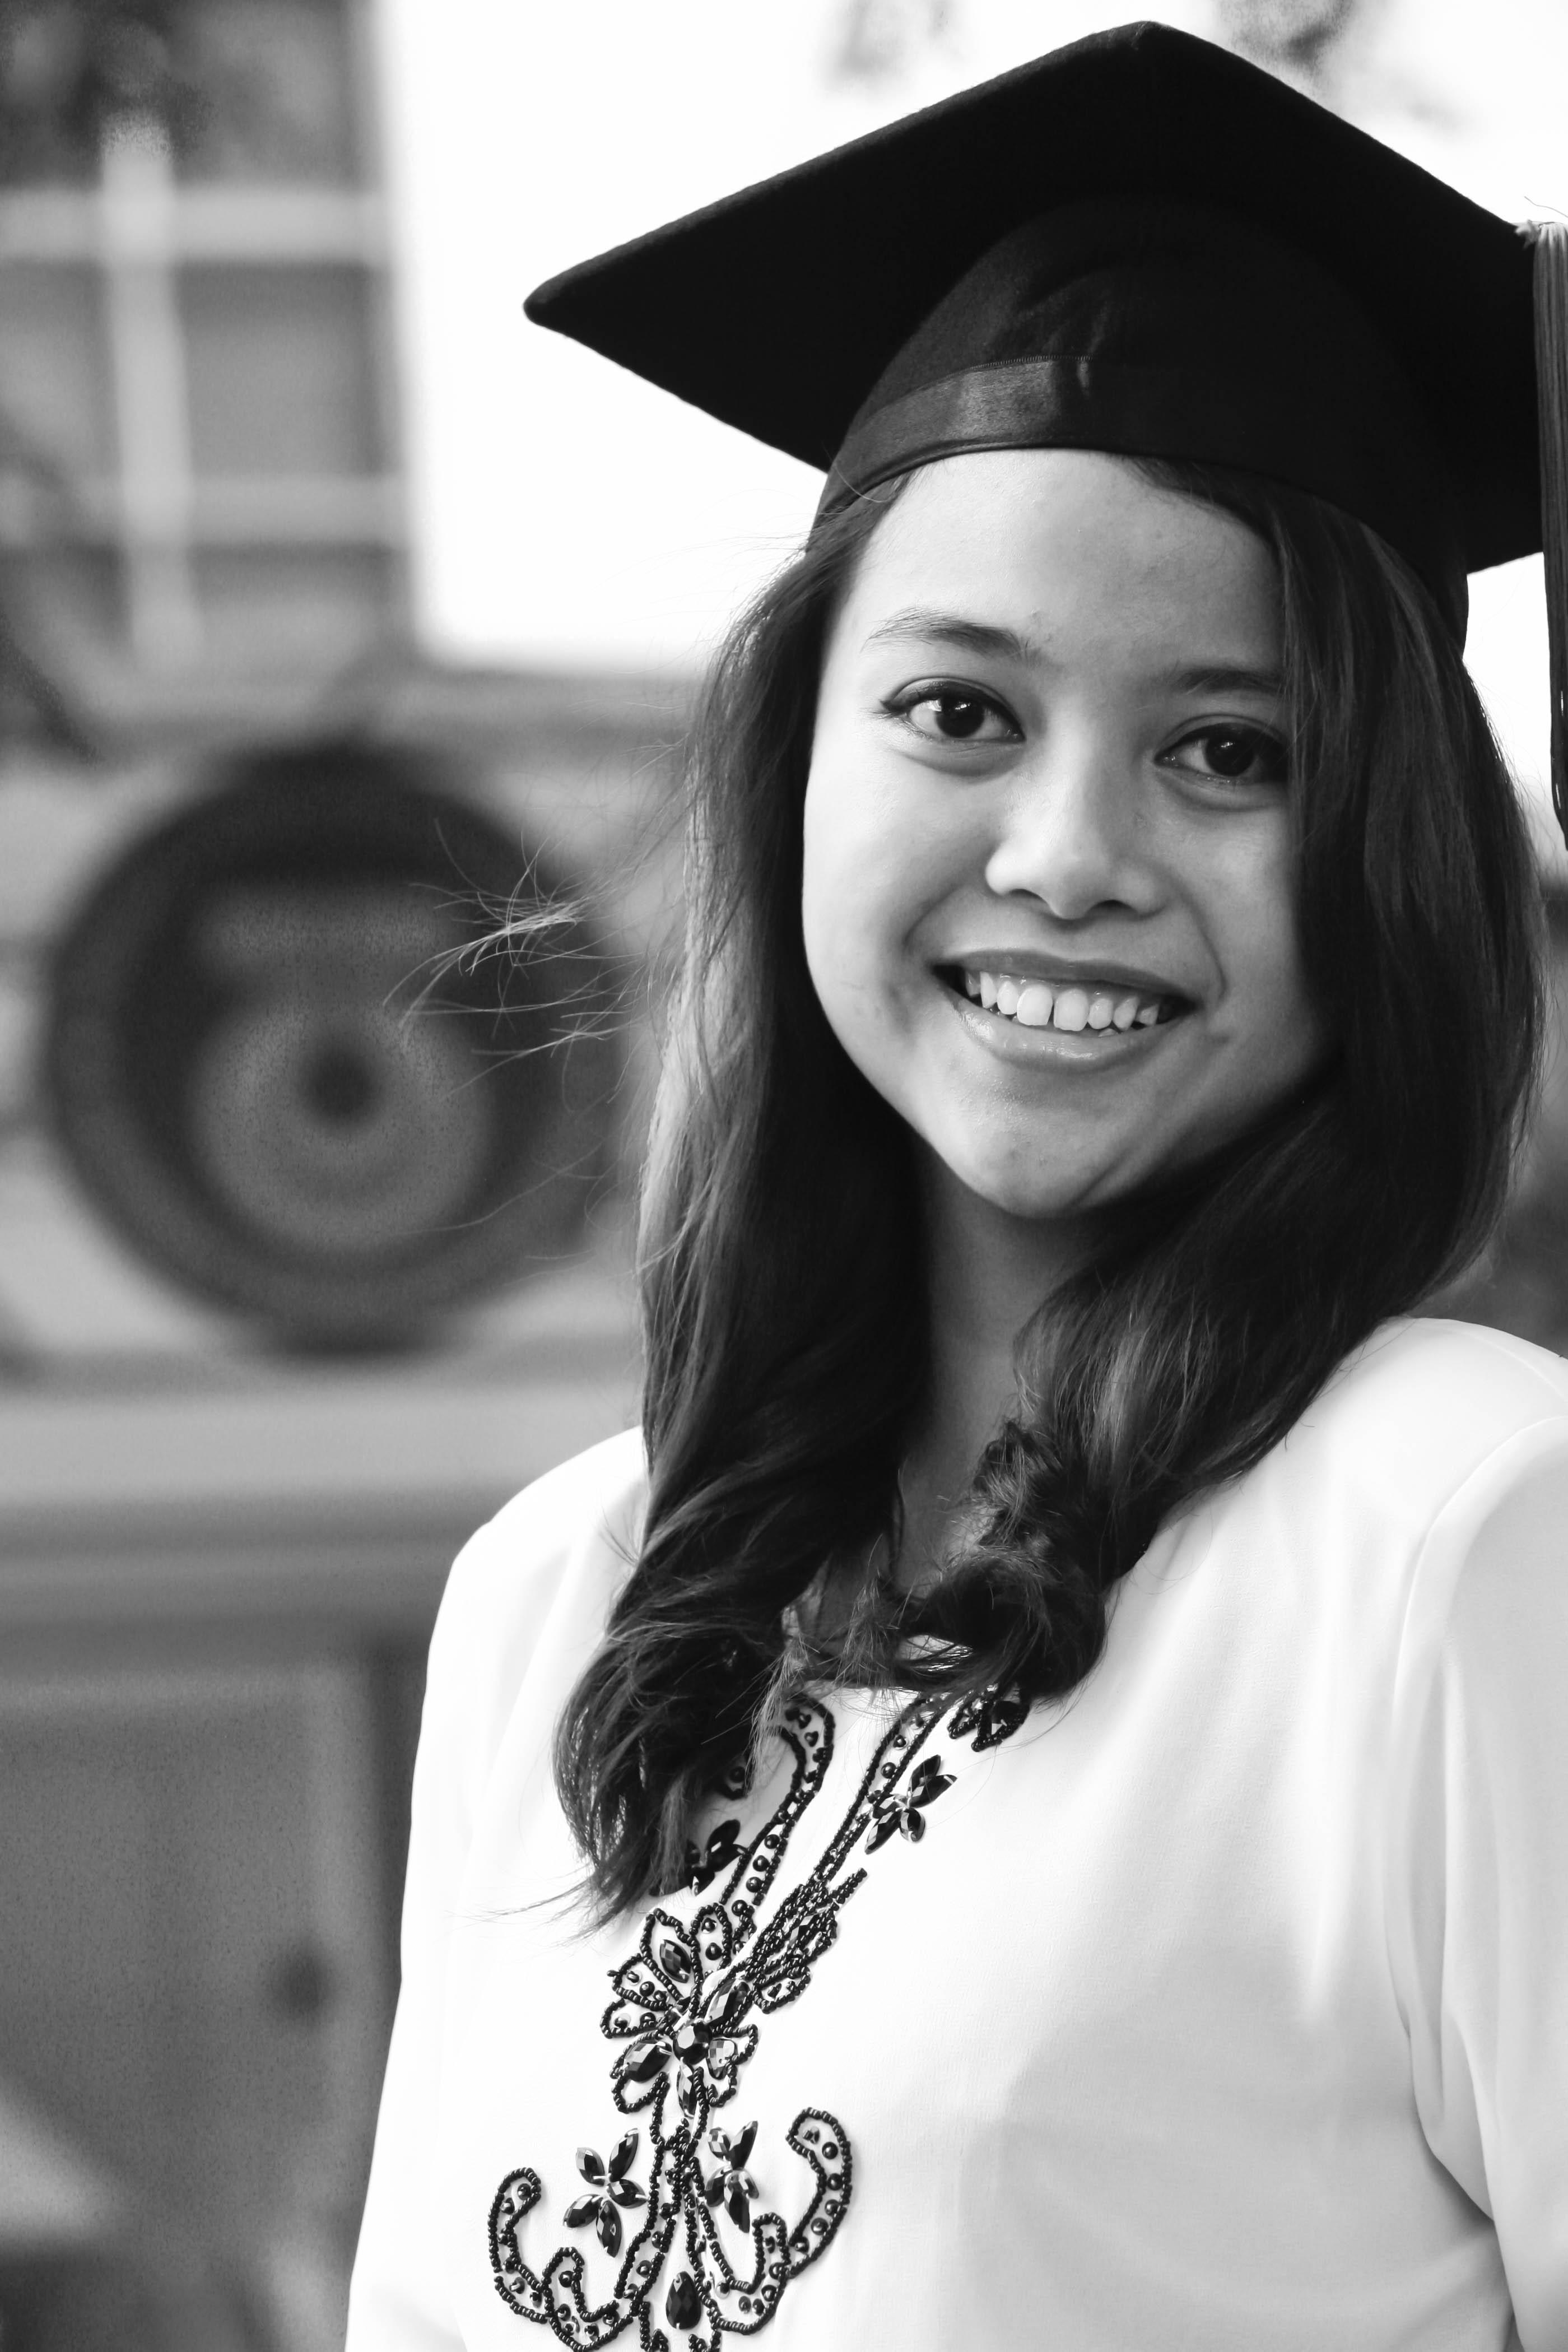 Utm Graduation Convocation Iqaeds Convocation Graduation Photography Portrait Of